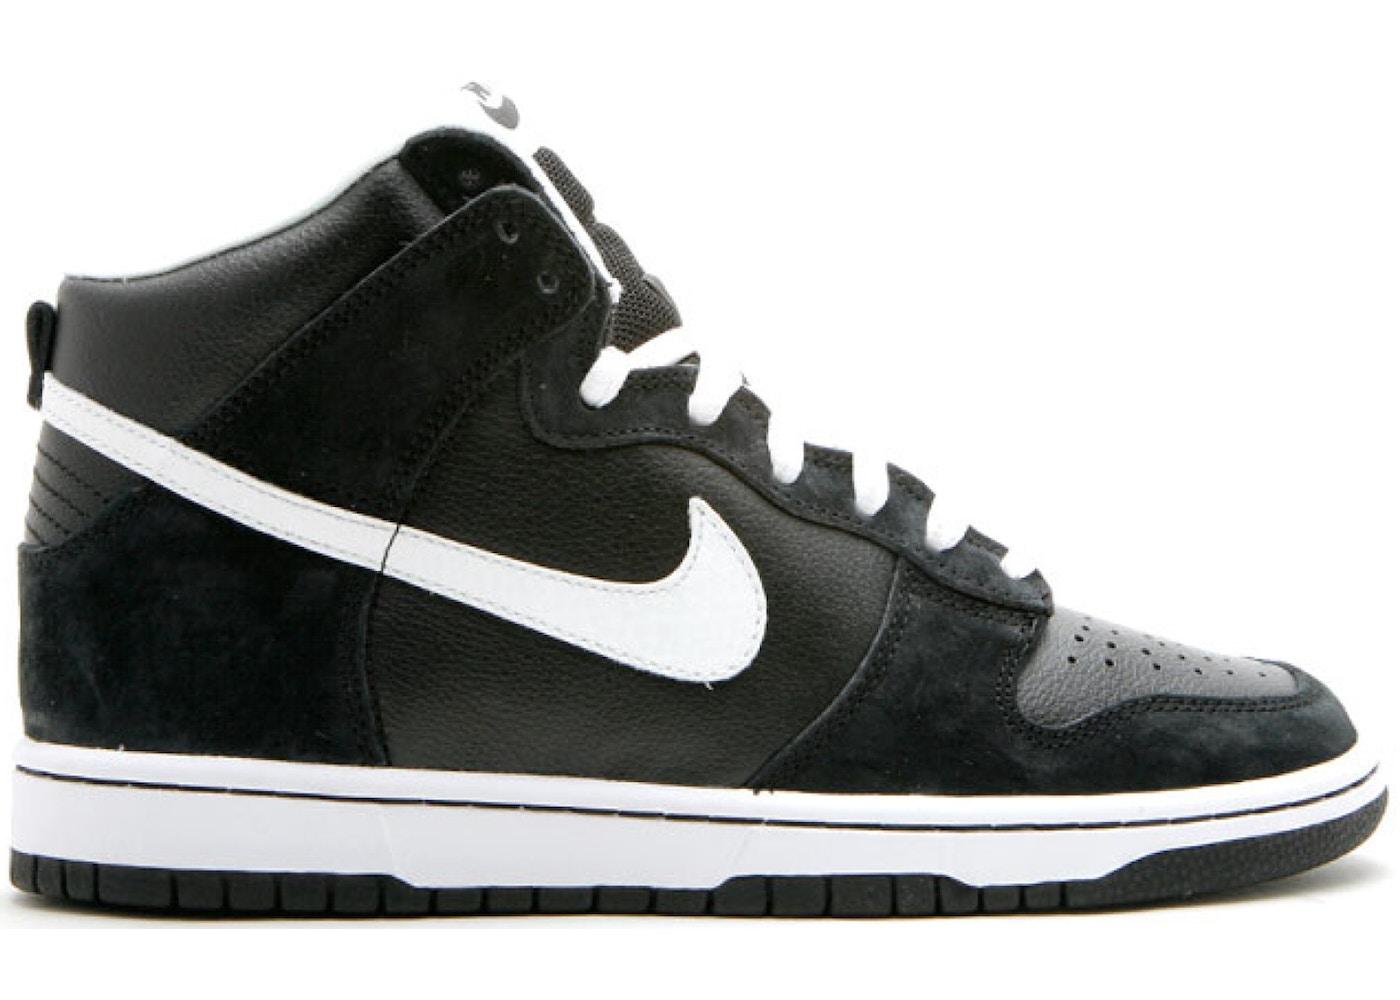 timeless design 2425e 67e7d Buy Nike SB SB Dunk High Shoes  Deadstock Sneakers